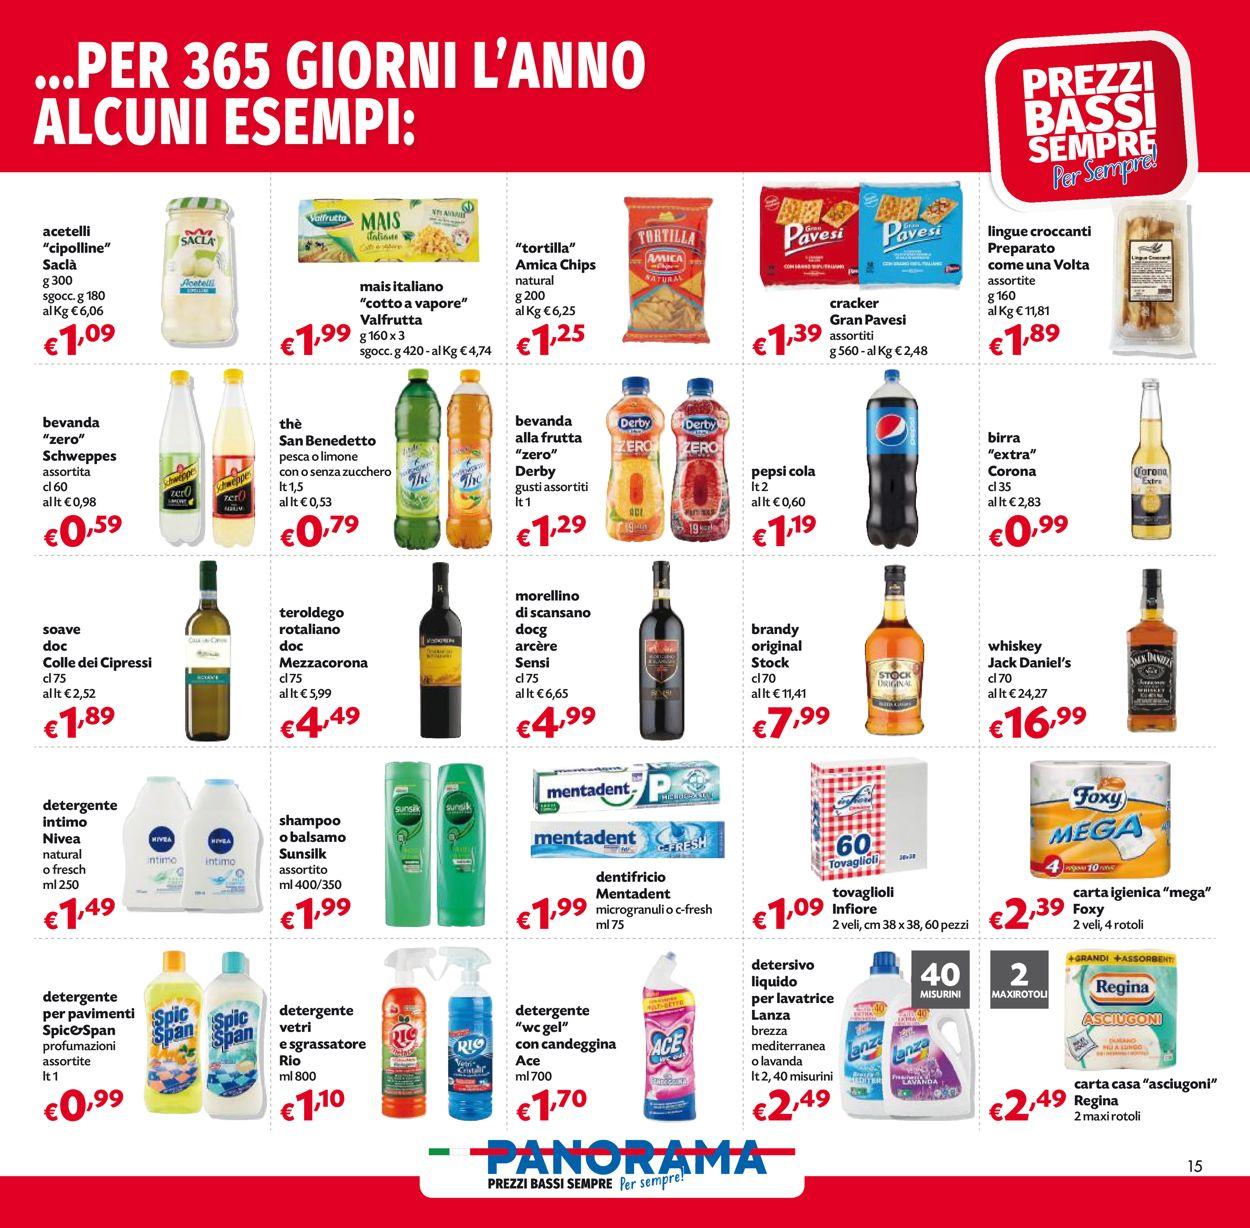 Volantino Pam Panorama - Pasqua 2021! - Offerte 22/03-05/04/2021 (Pagina 15)